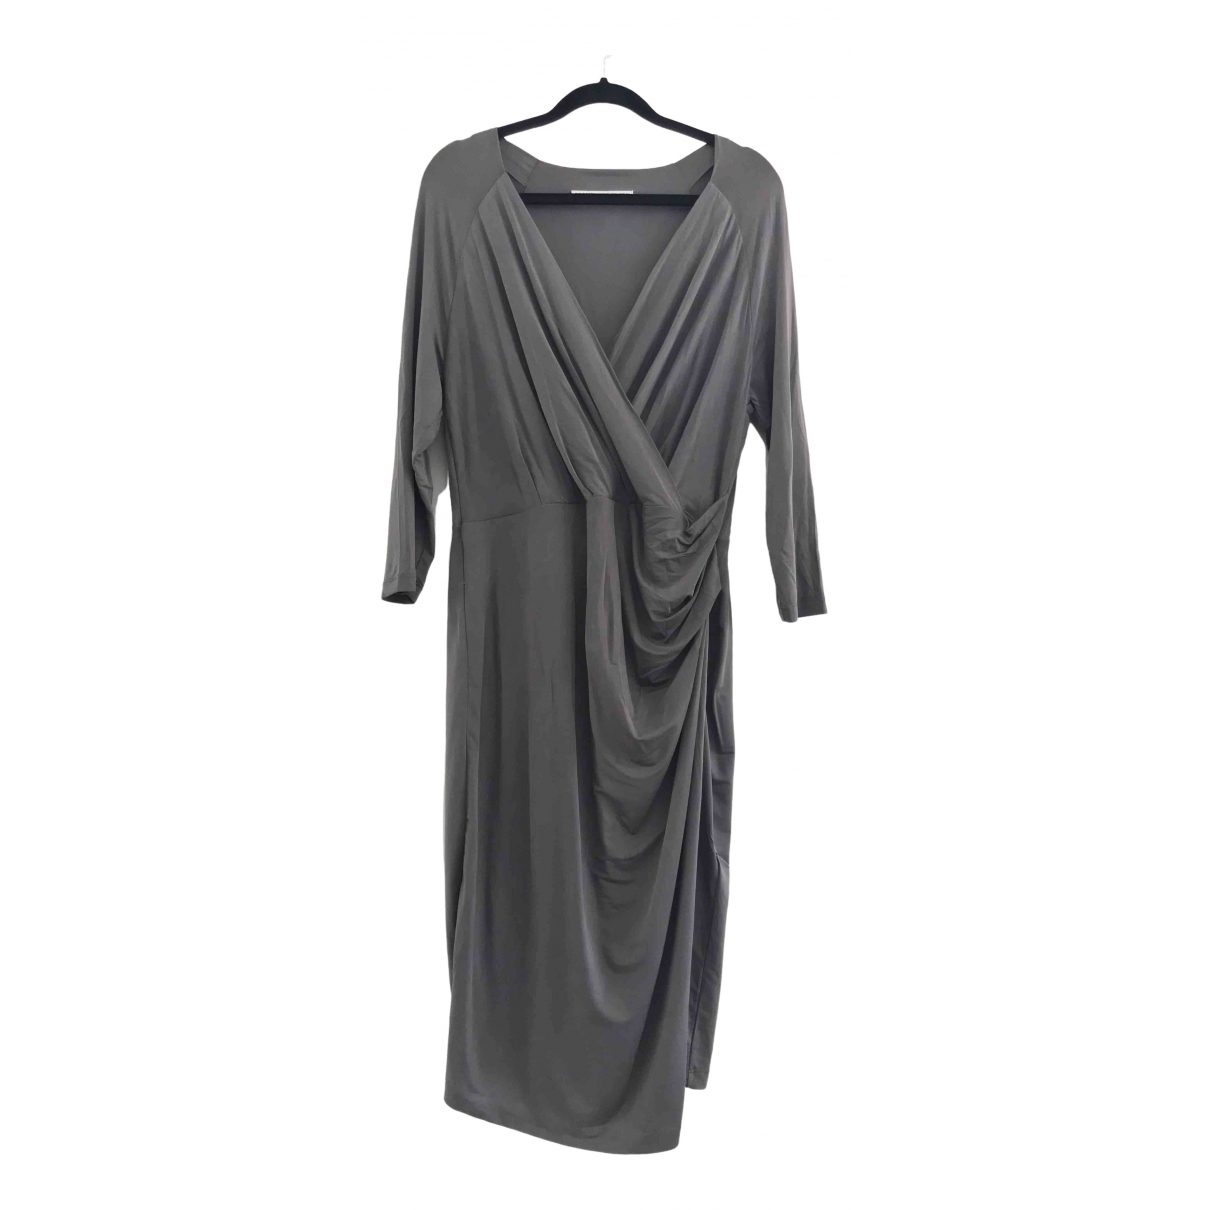 Day Birger & Mikkelsen \N Kleid in  Grau Synthetik